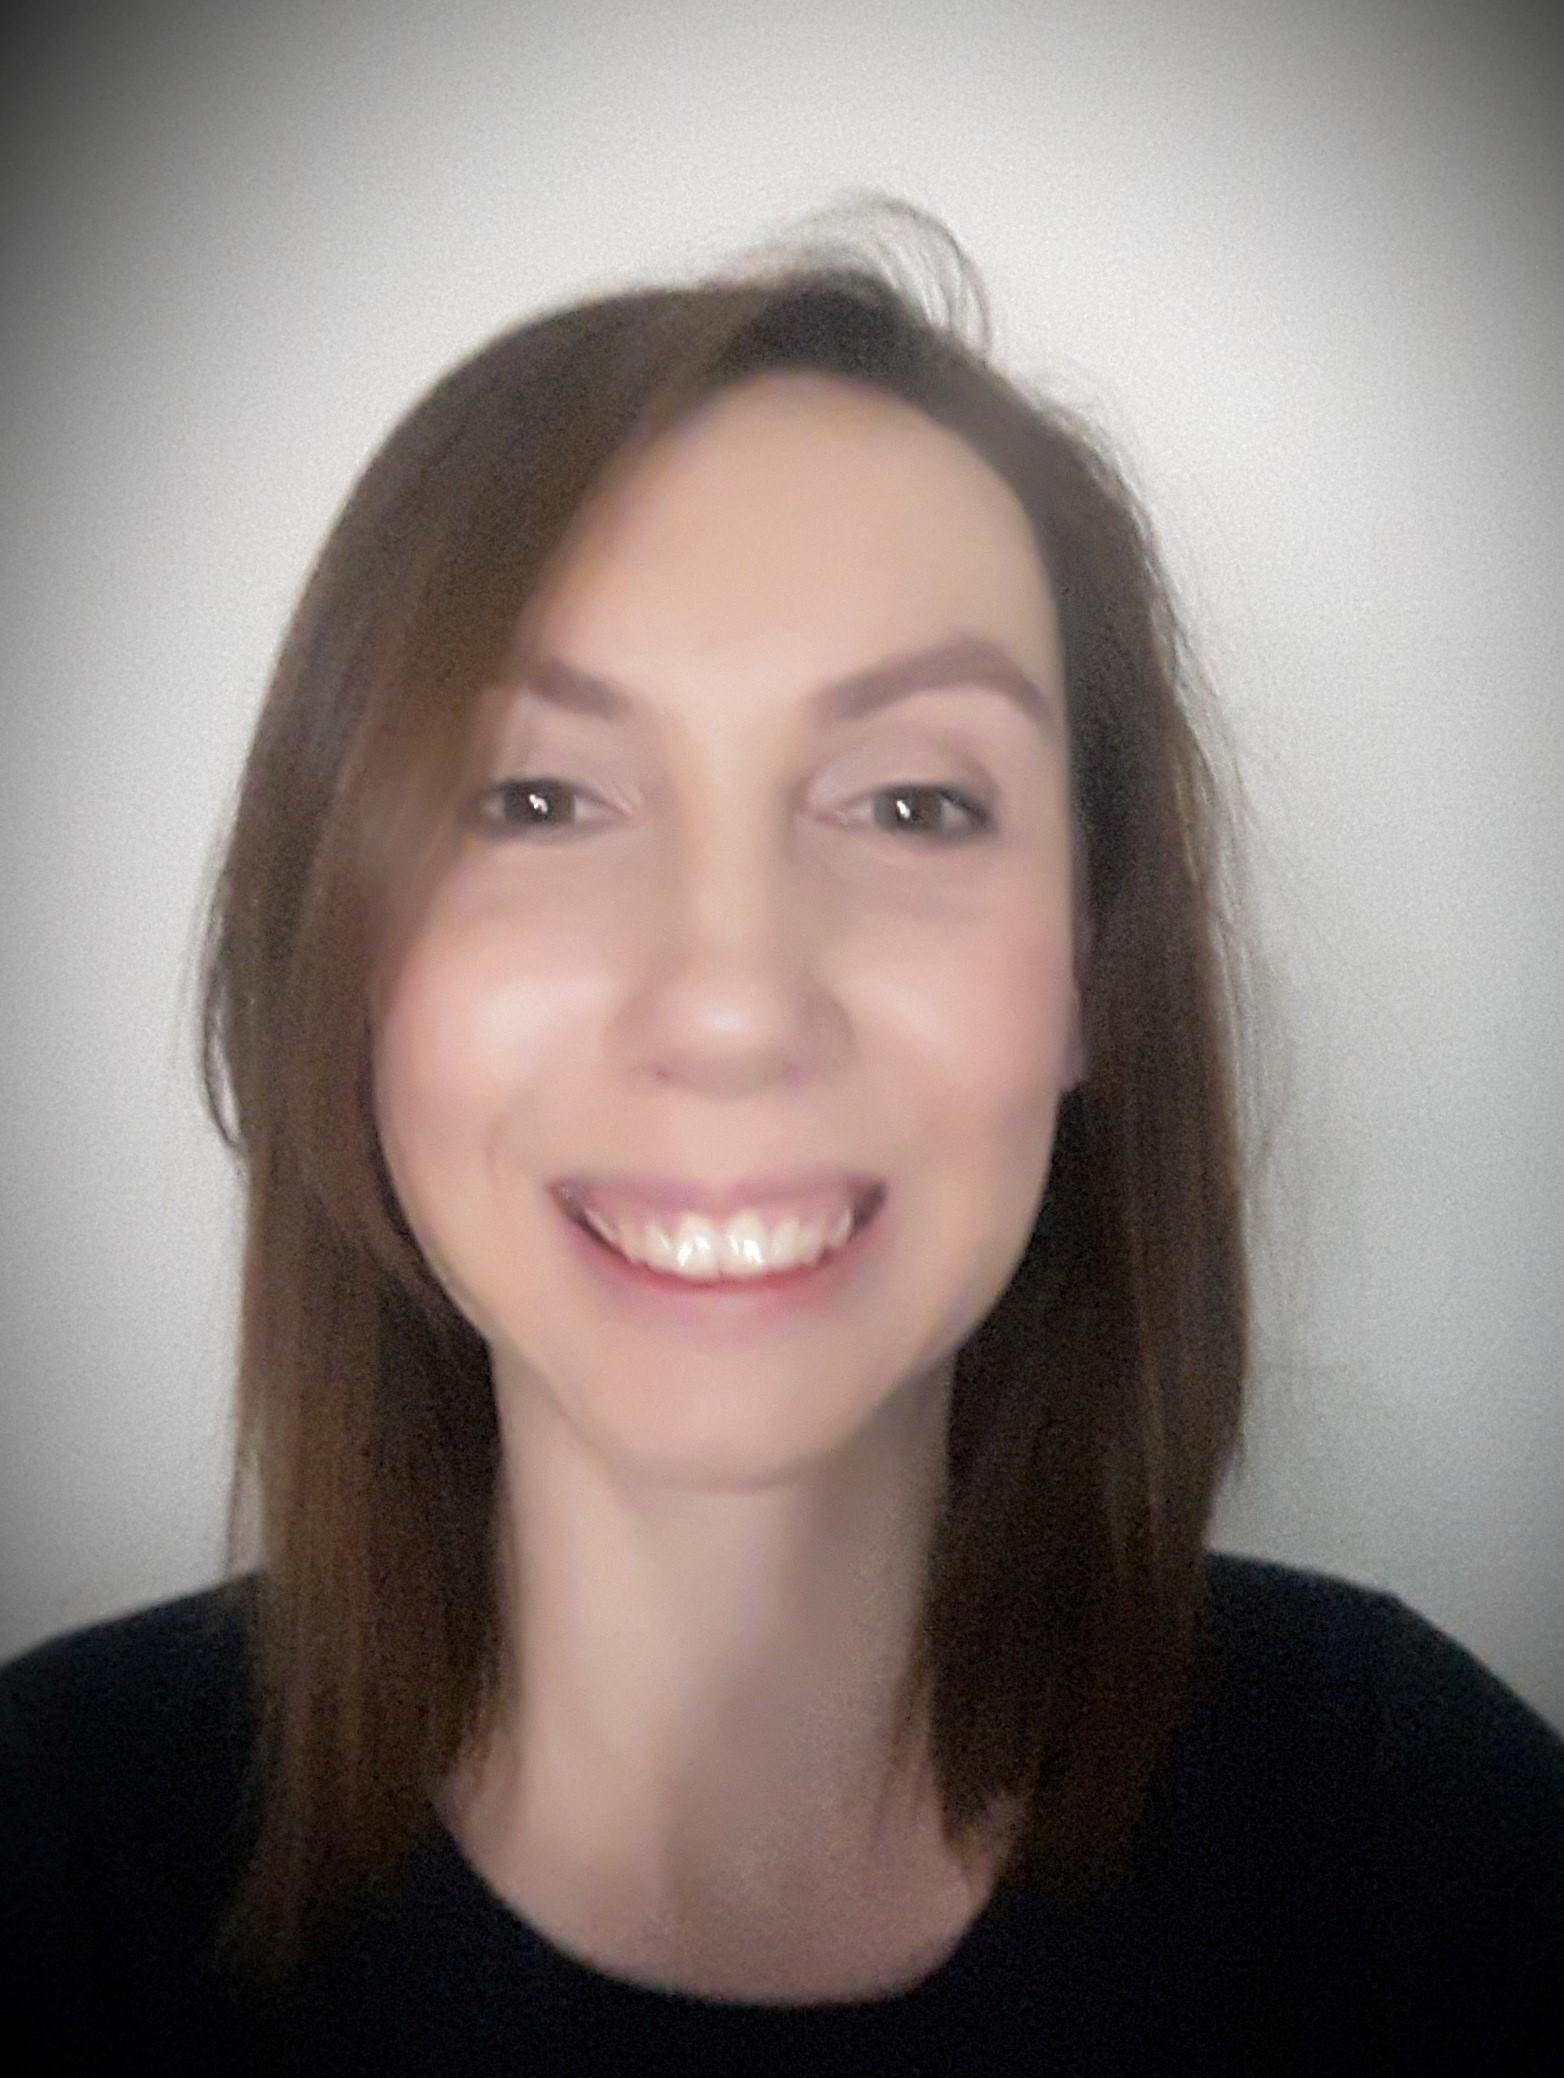 Victoria Oliver